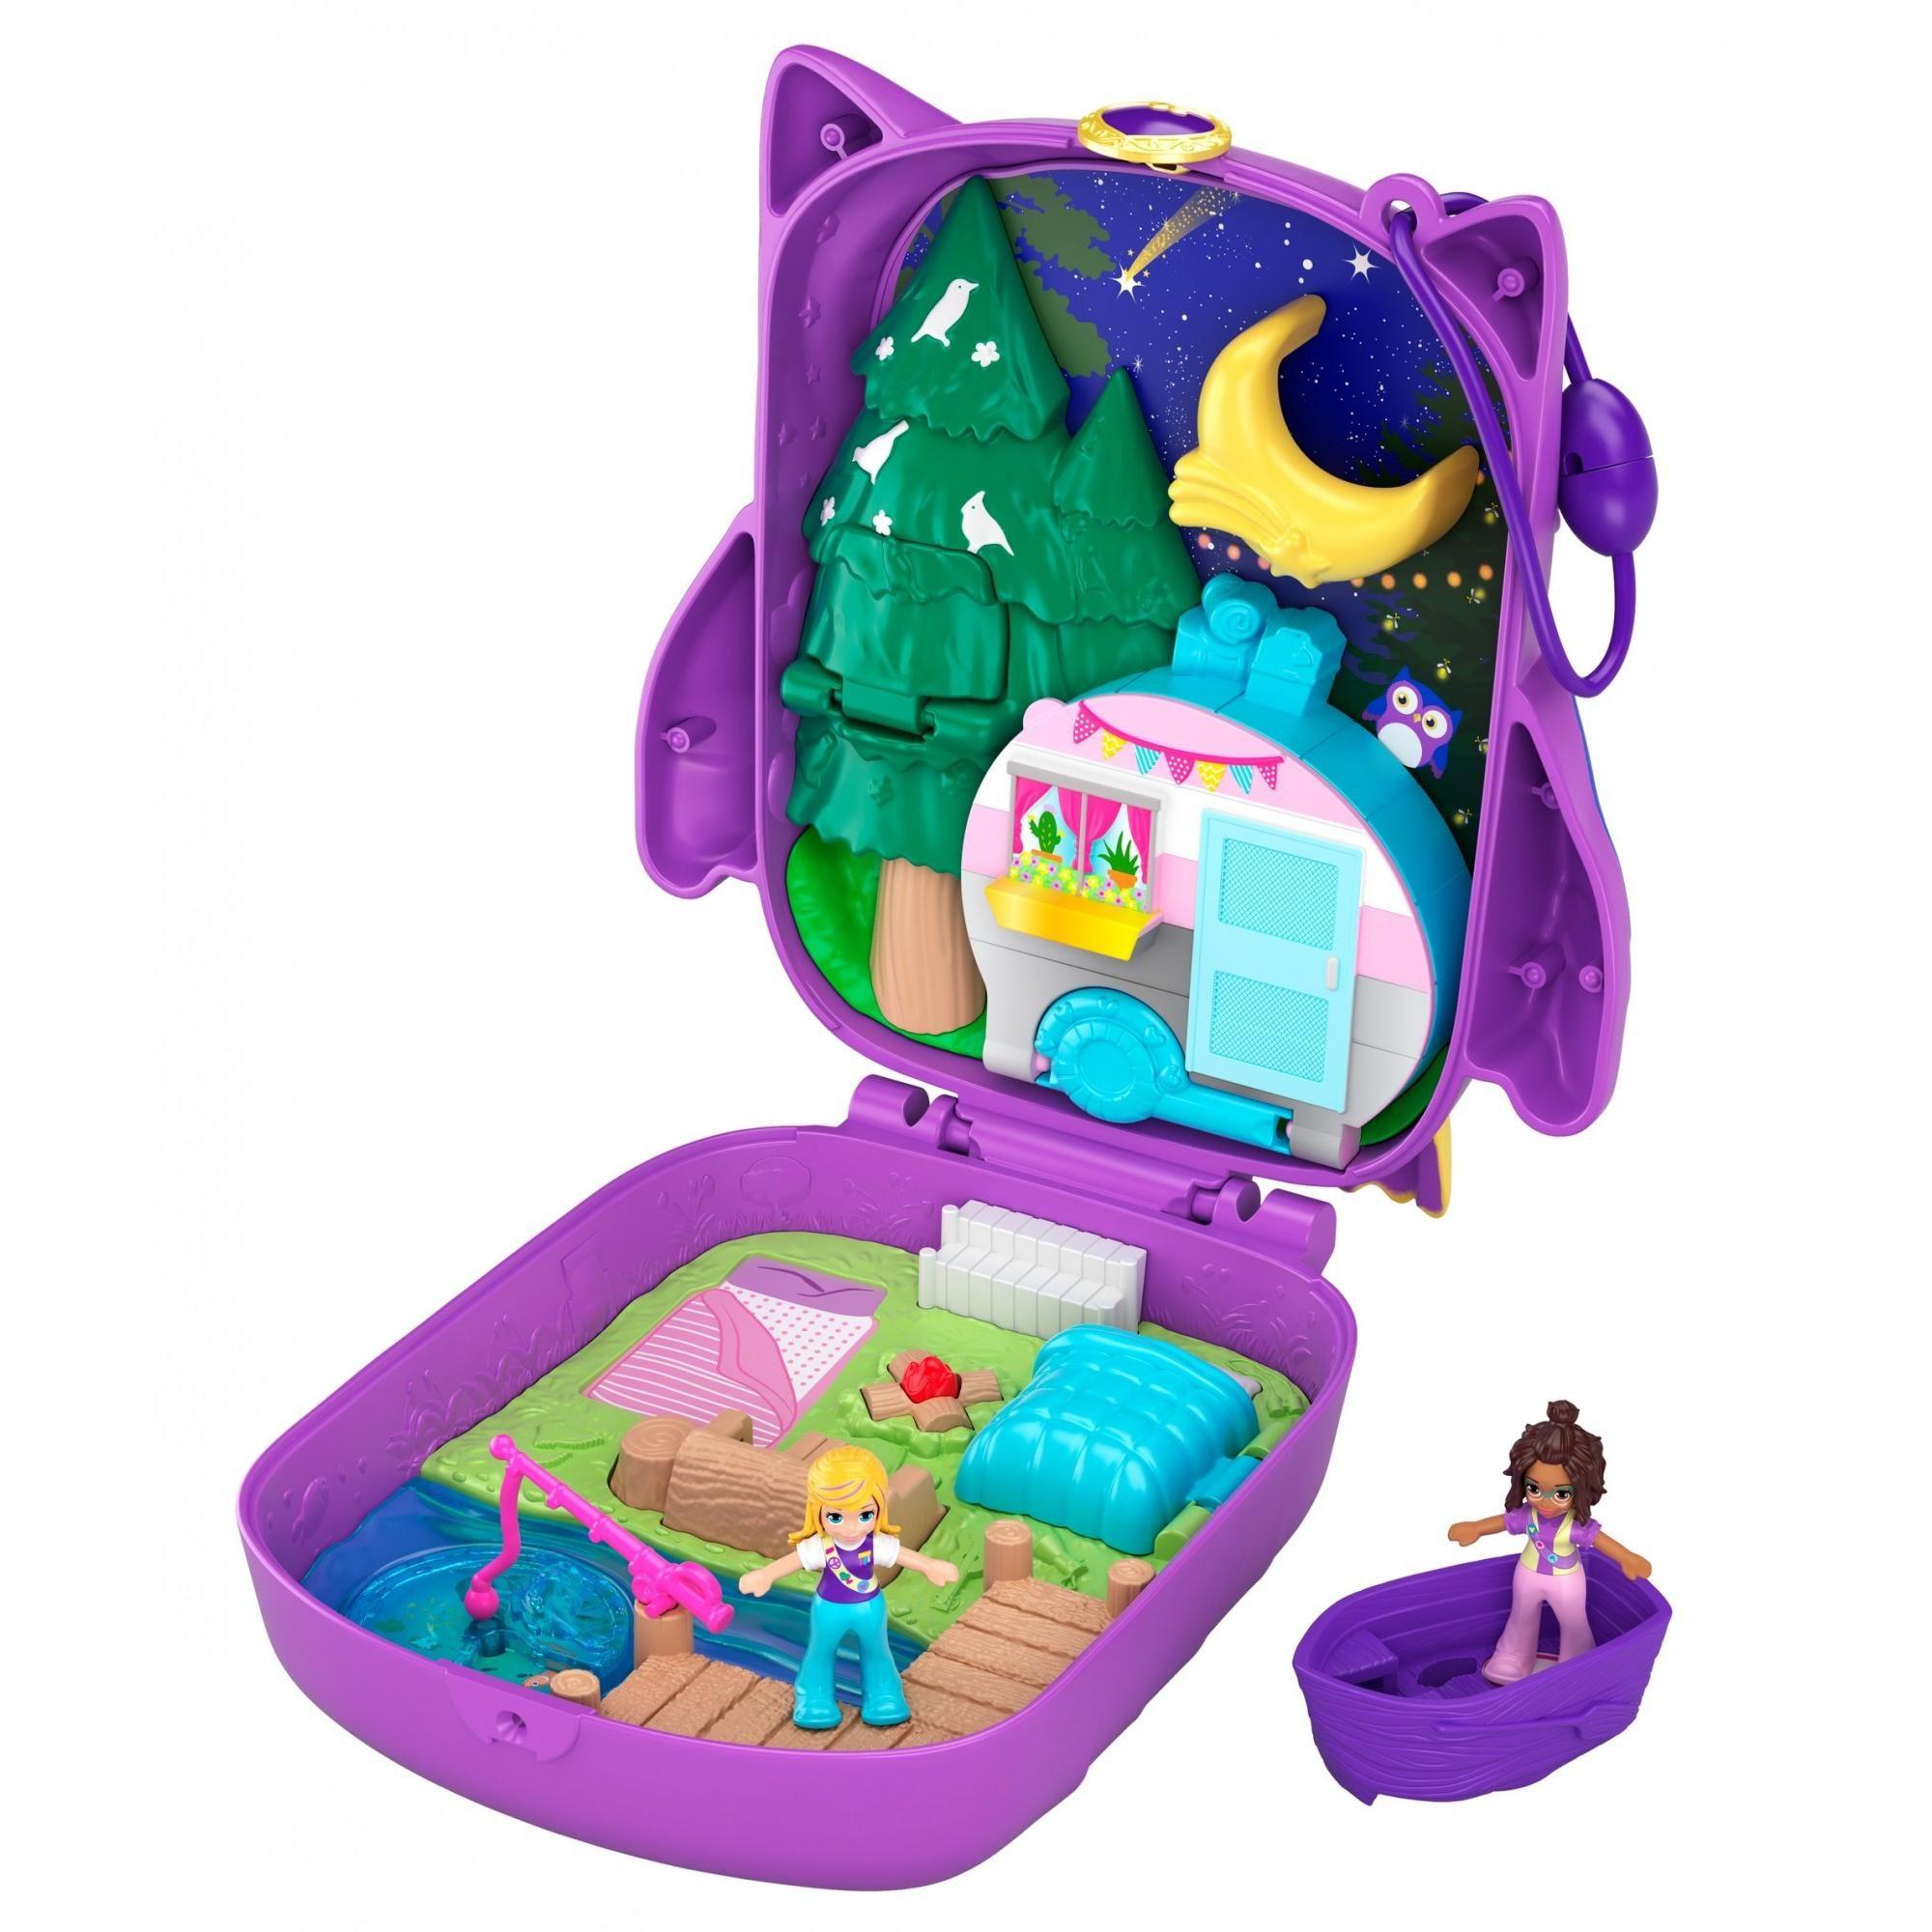 Polly Pocket Pocket World Owlnite Campsite Compact 2 Micro Dolls Accessories Walmart Com Polly Pocket Polly Pocket Dolls Playset